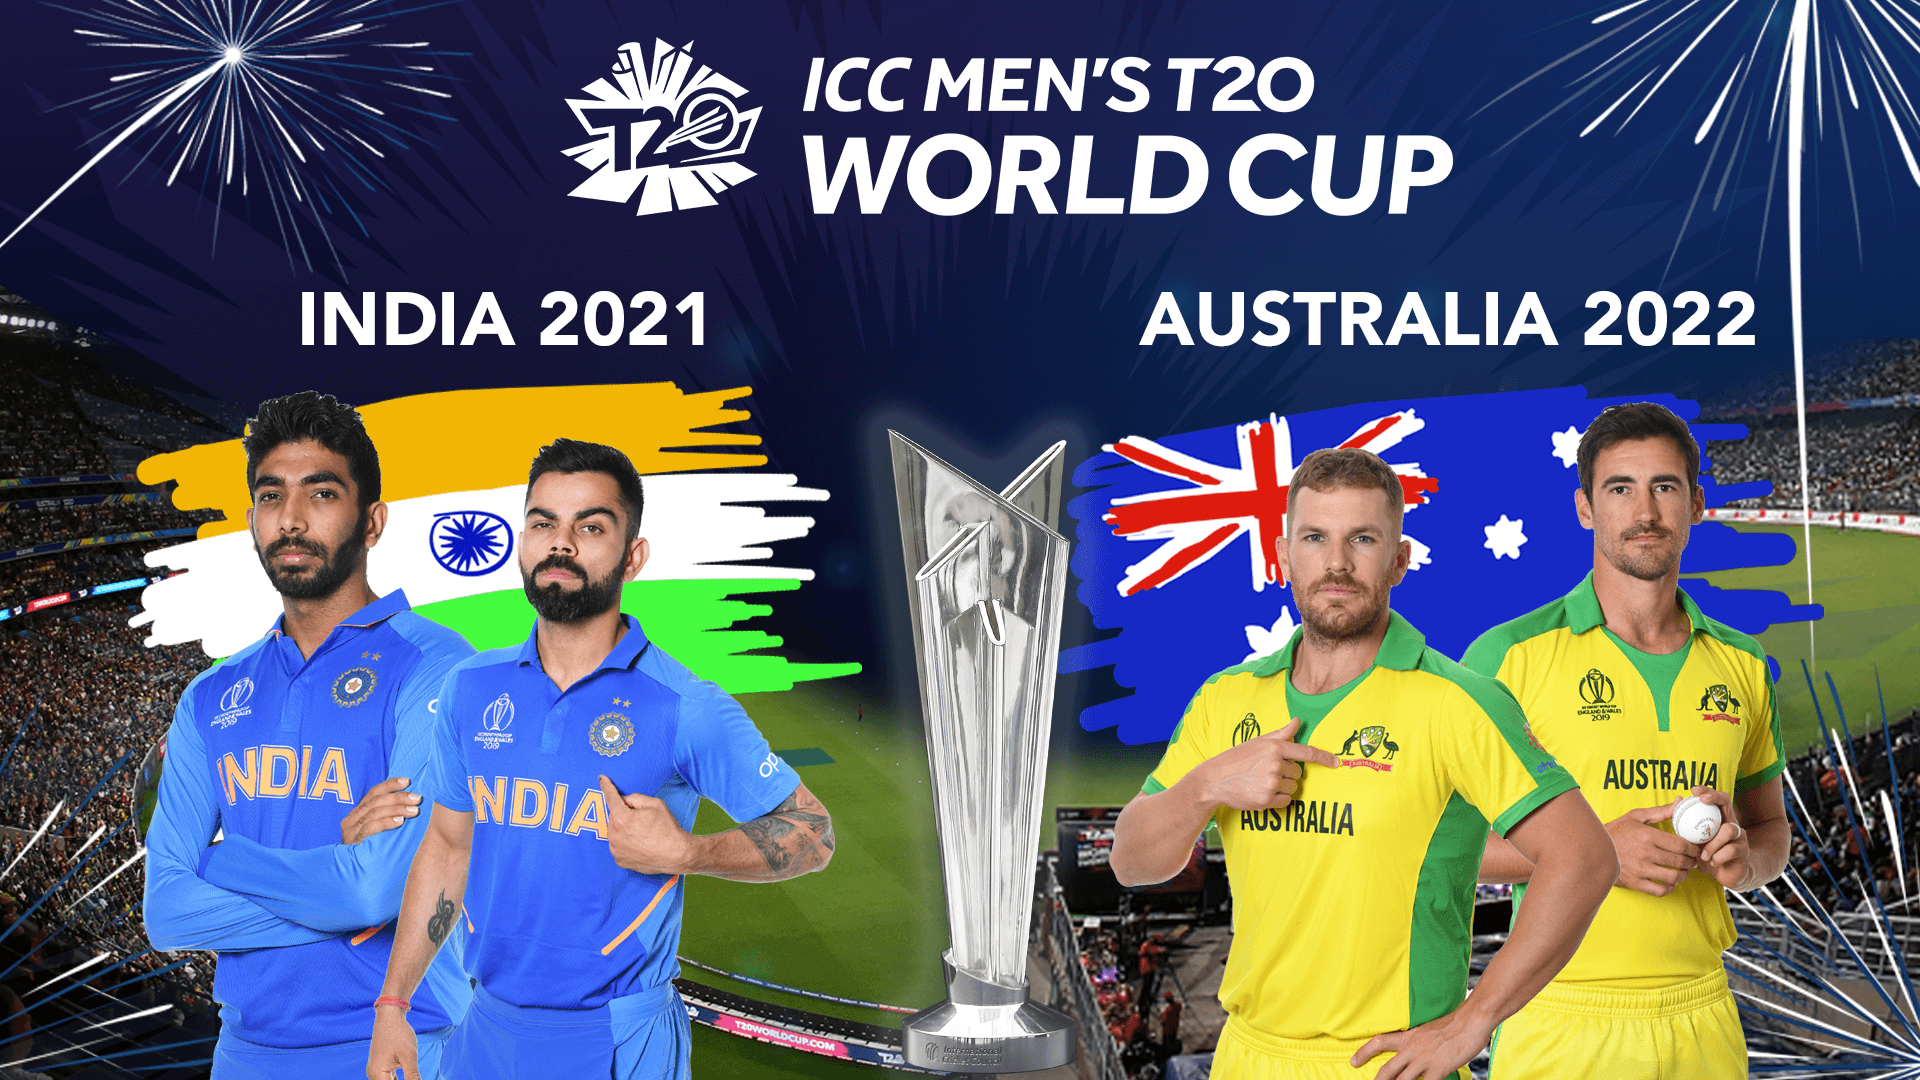 ICC Men's T20 World Cup IND-2021